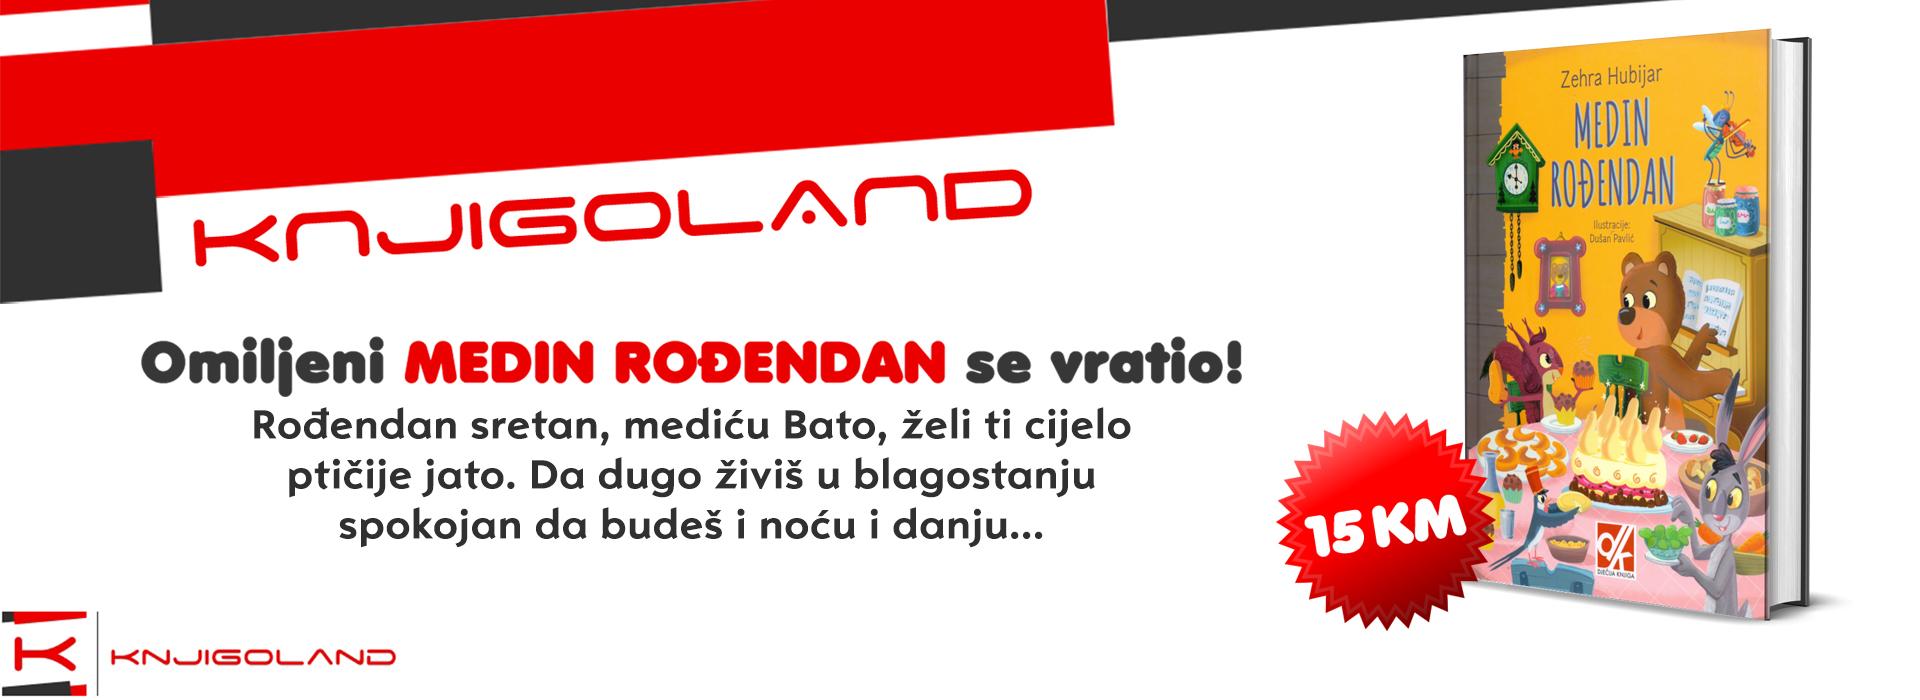 medin_rodjendan_1920x700_1